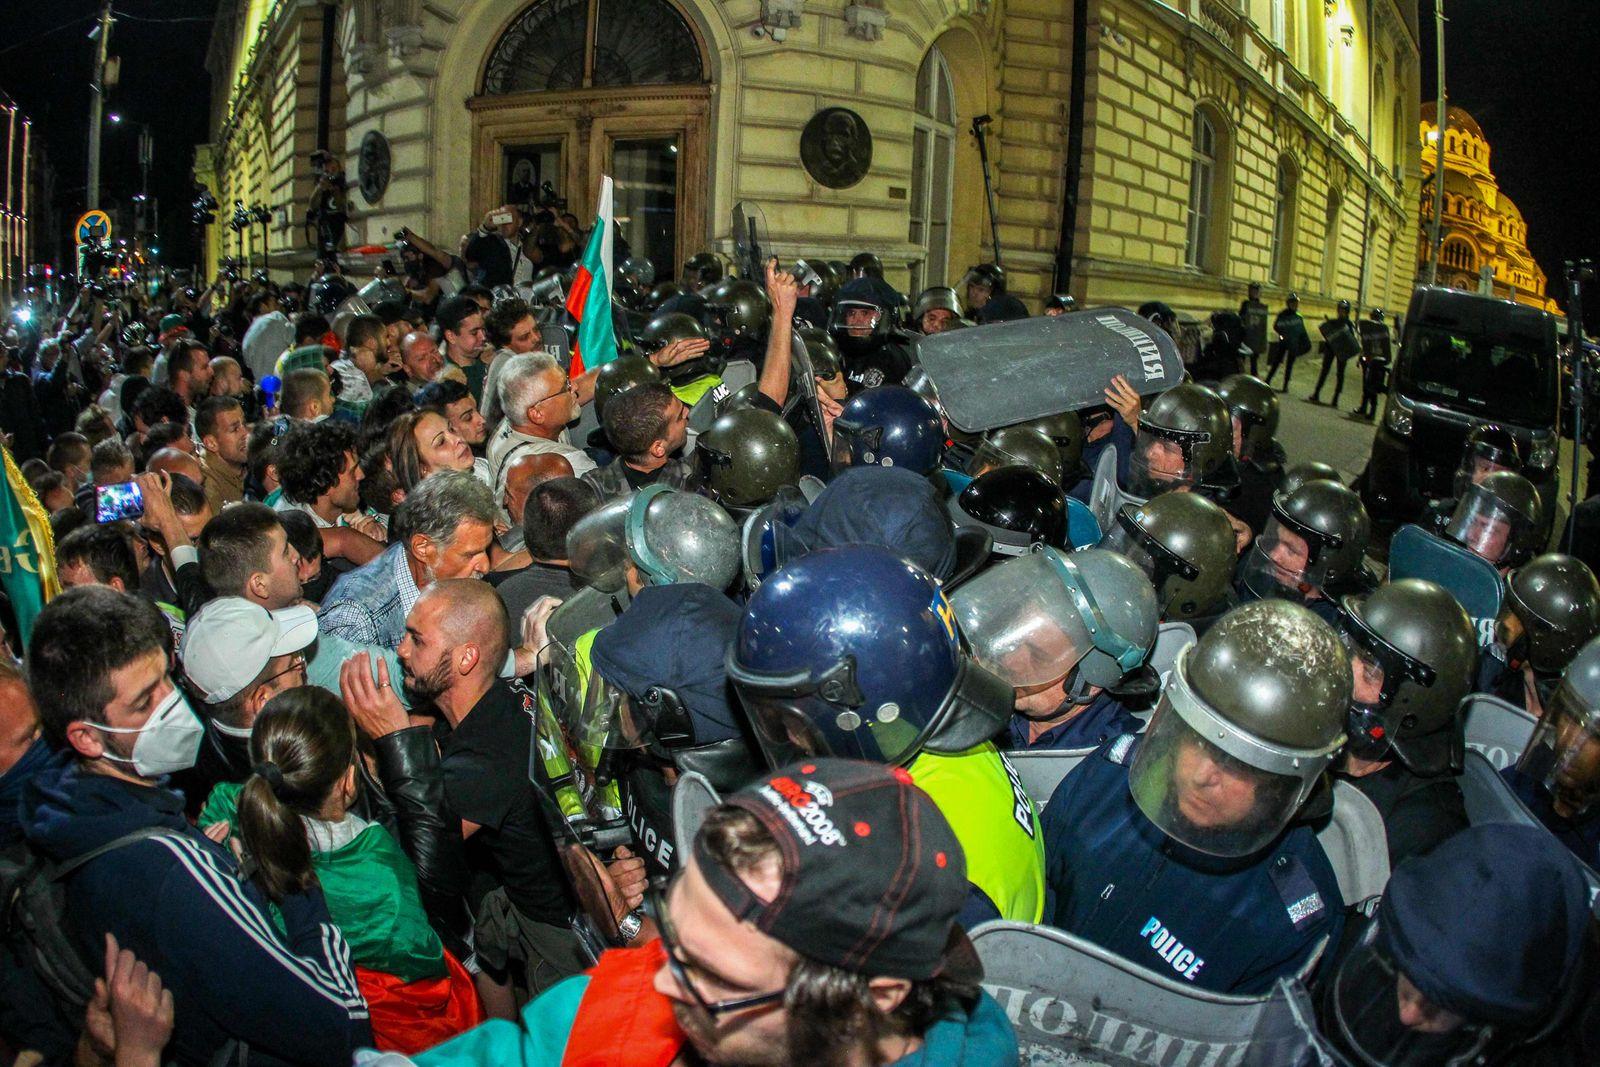 BULGARIA-DEMO-POLITICS